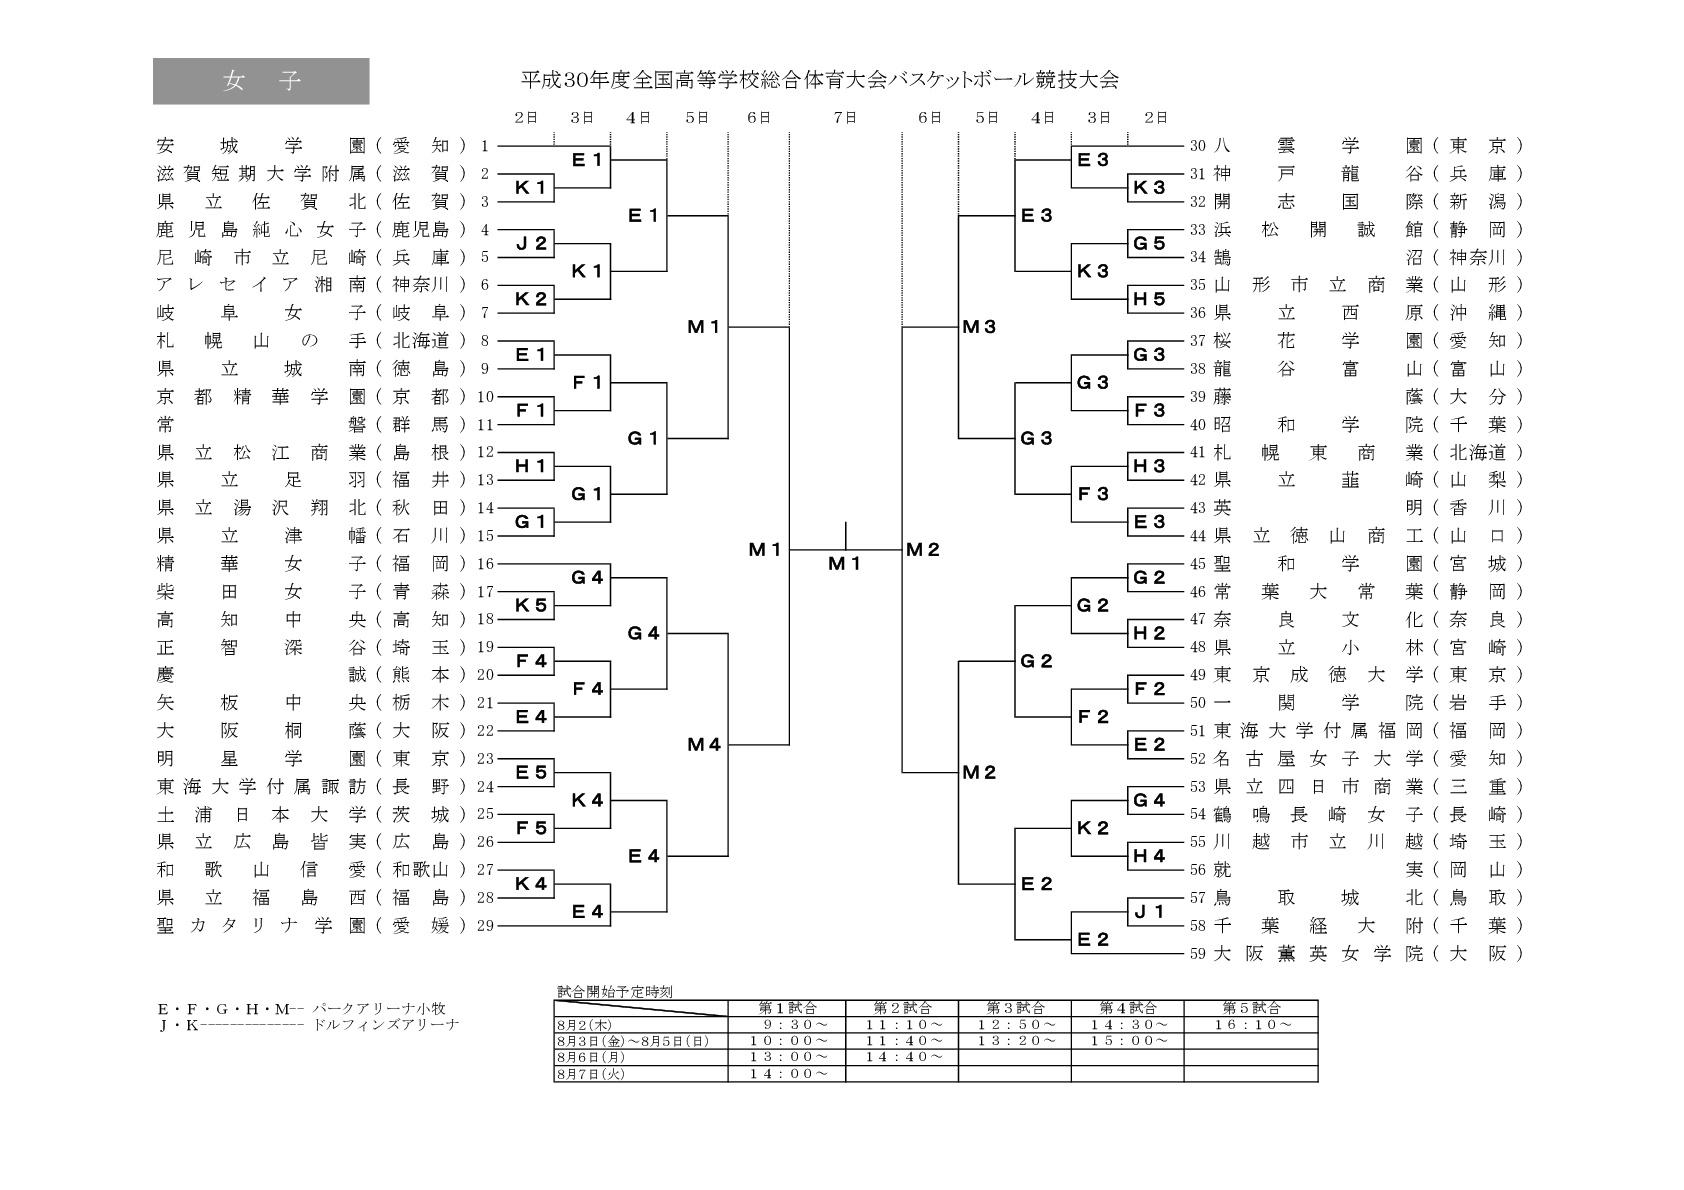 2018IH_tournament_WOMEN-001.jpg